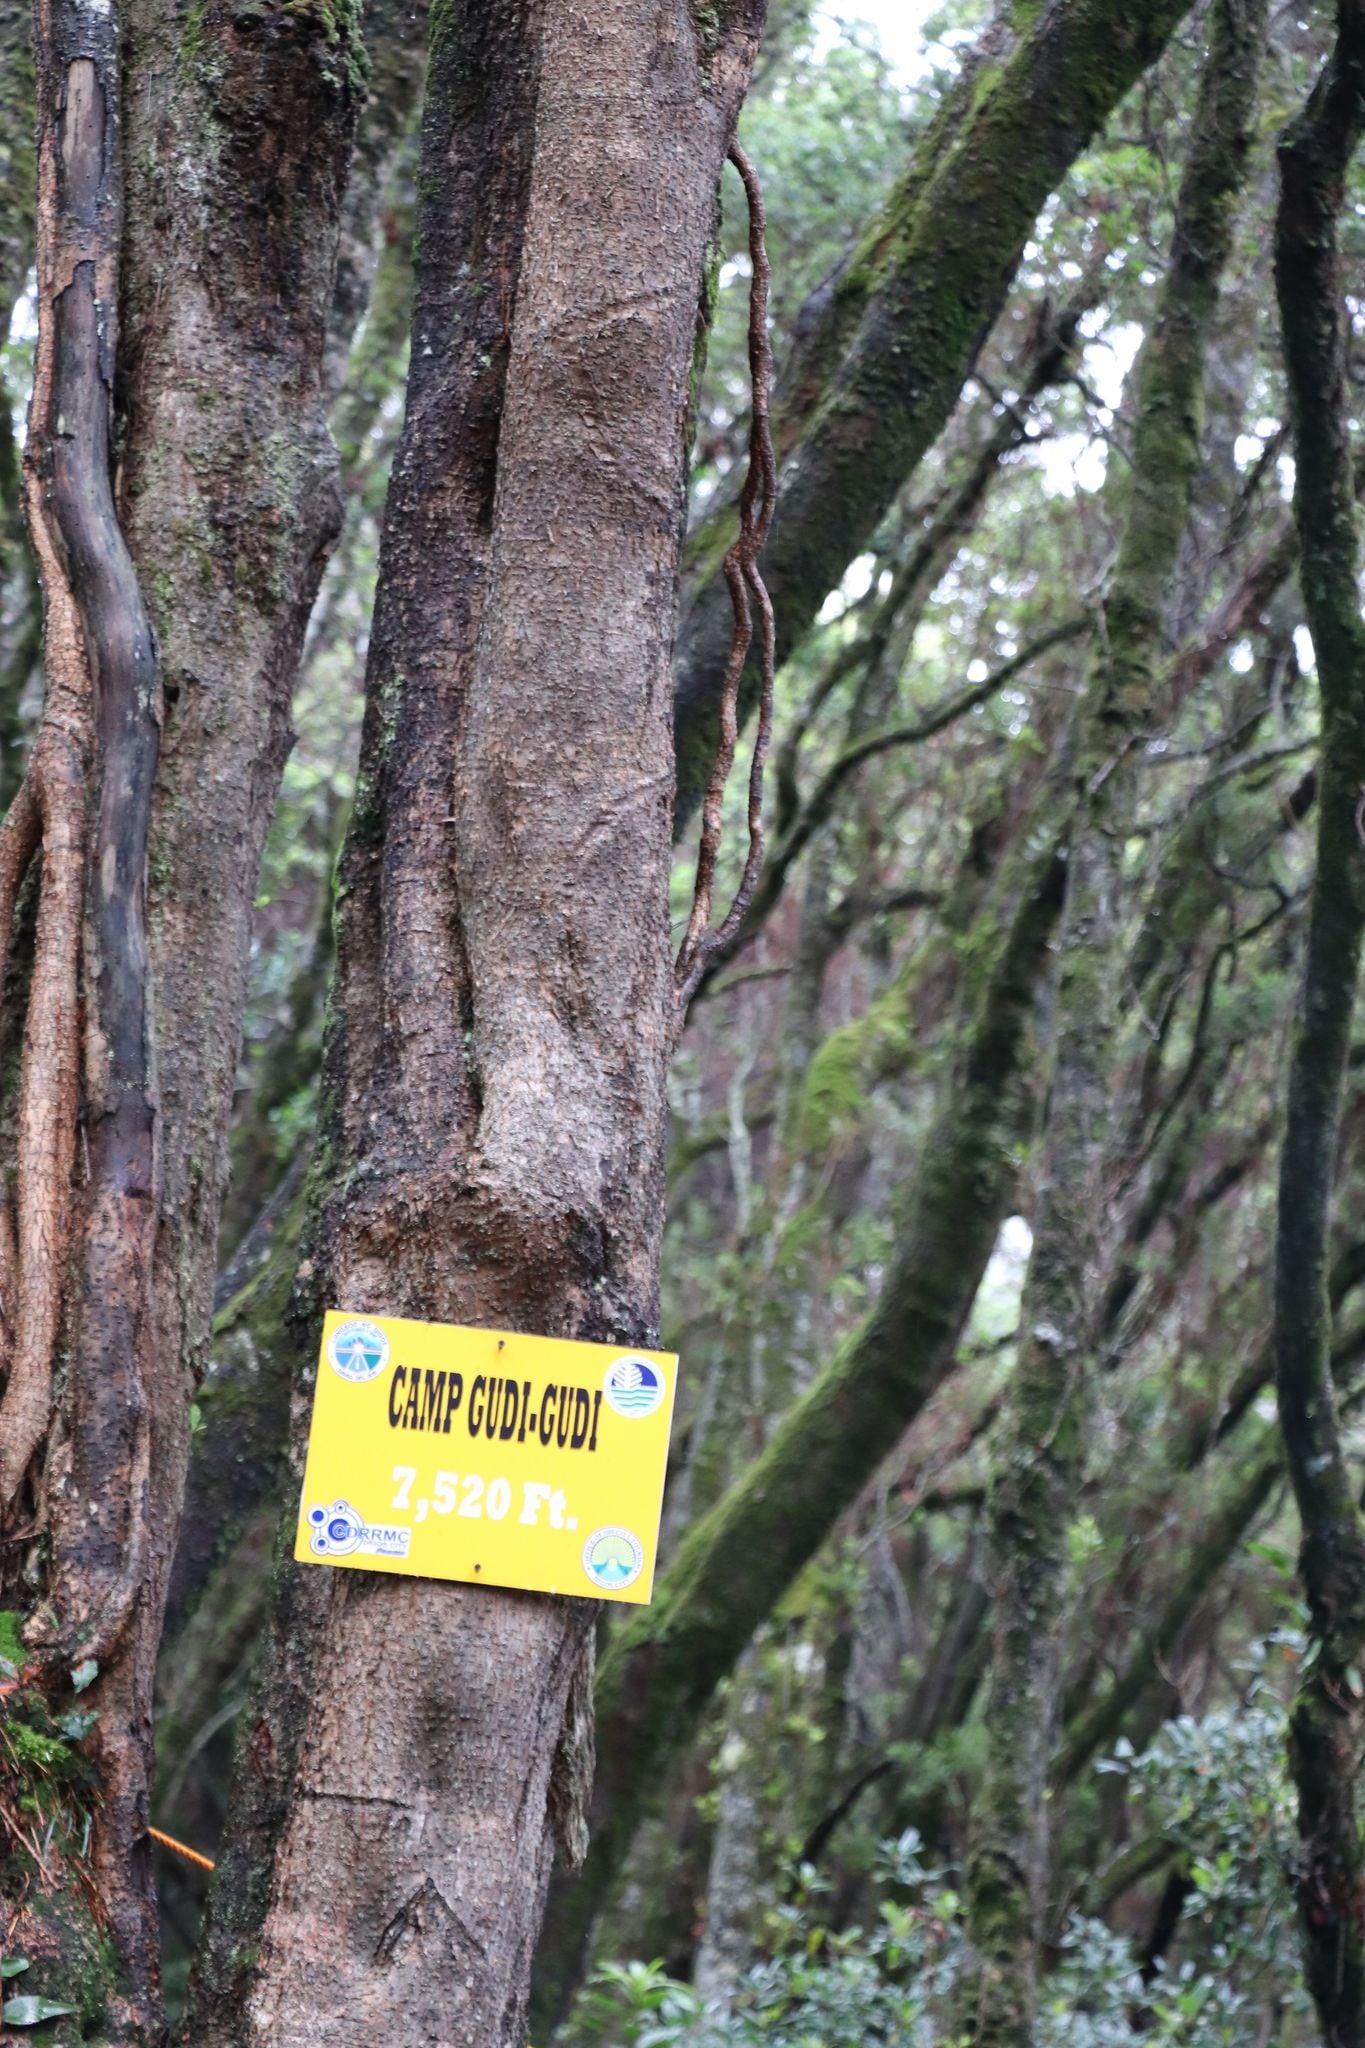 Mt. Apo - Camp Gudi-Gudi marker